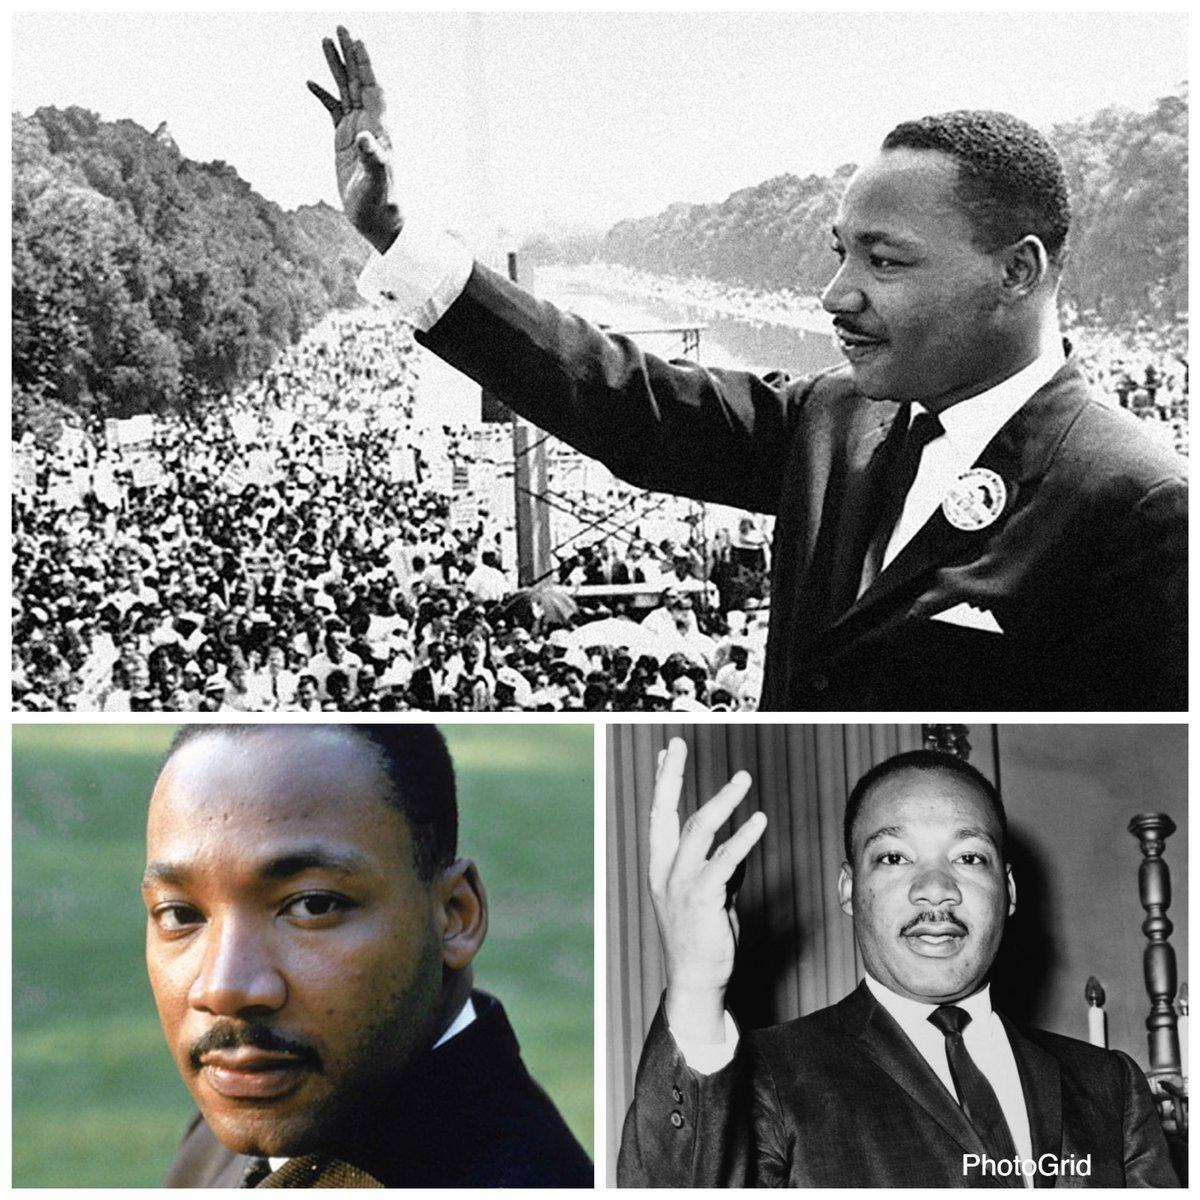 @BlackMusicHstry #MLKDay #DrMartinLutherKingJr #IHaveADream